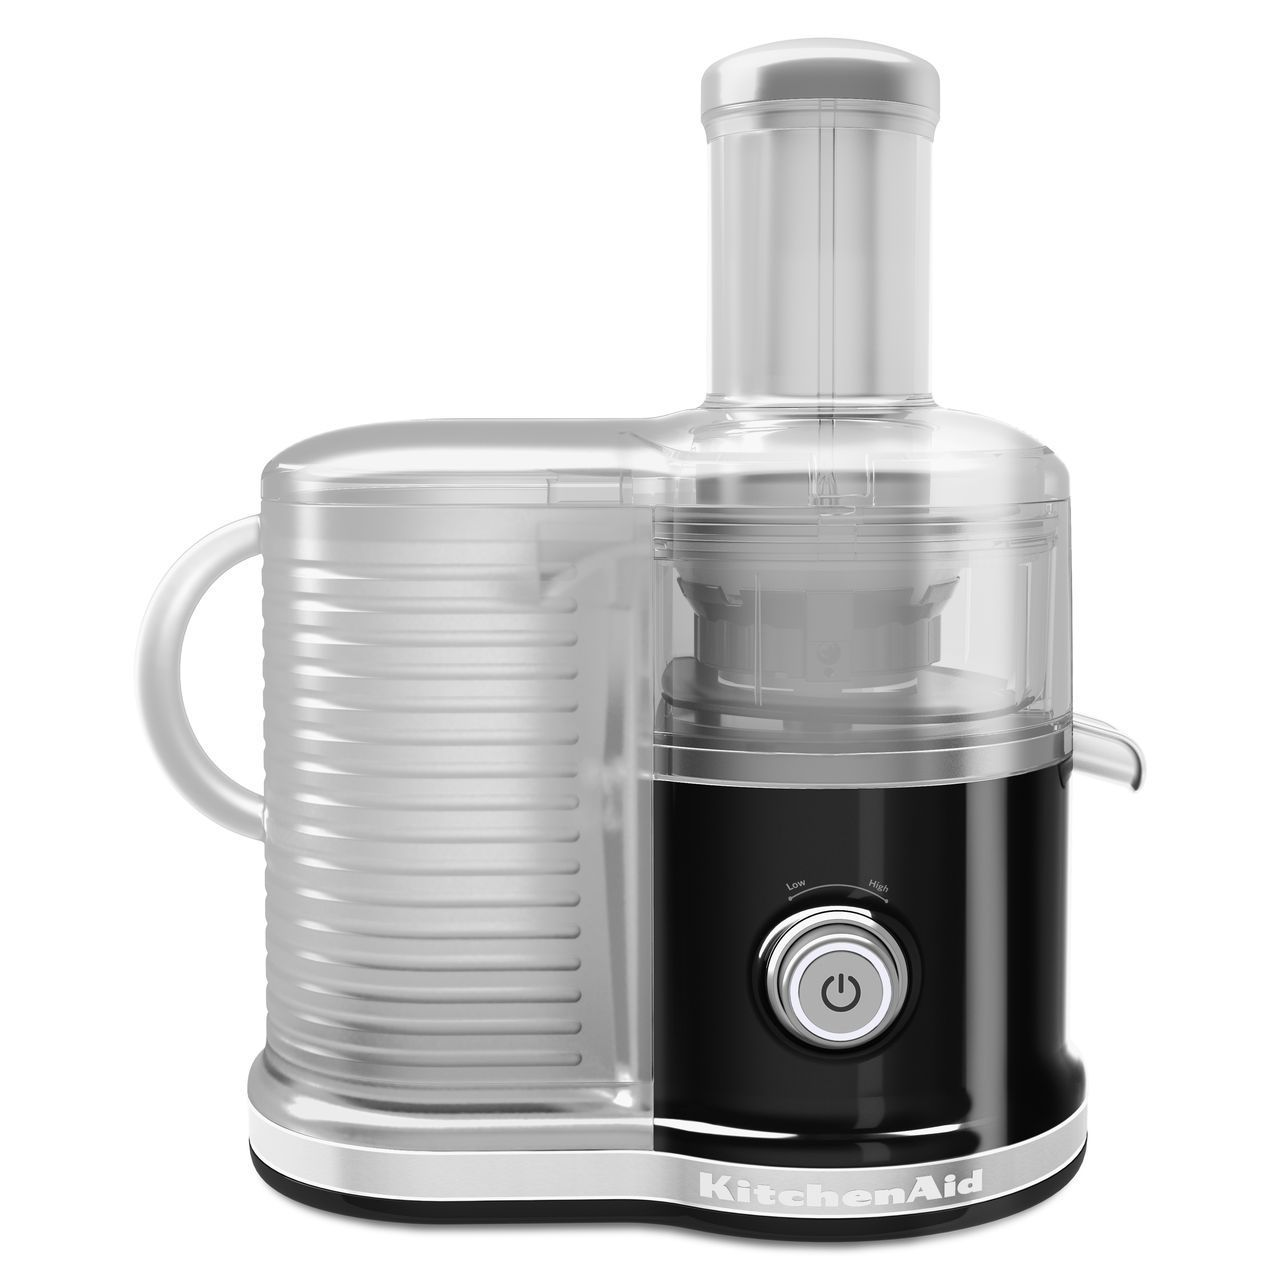 KitchenAid® Easy Clean Juicer (fast juicer) - Walmart.com